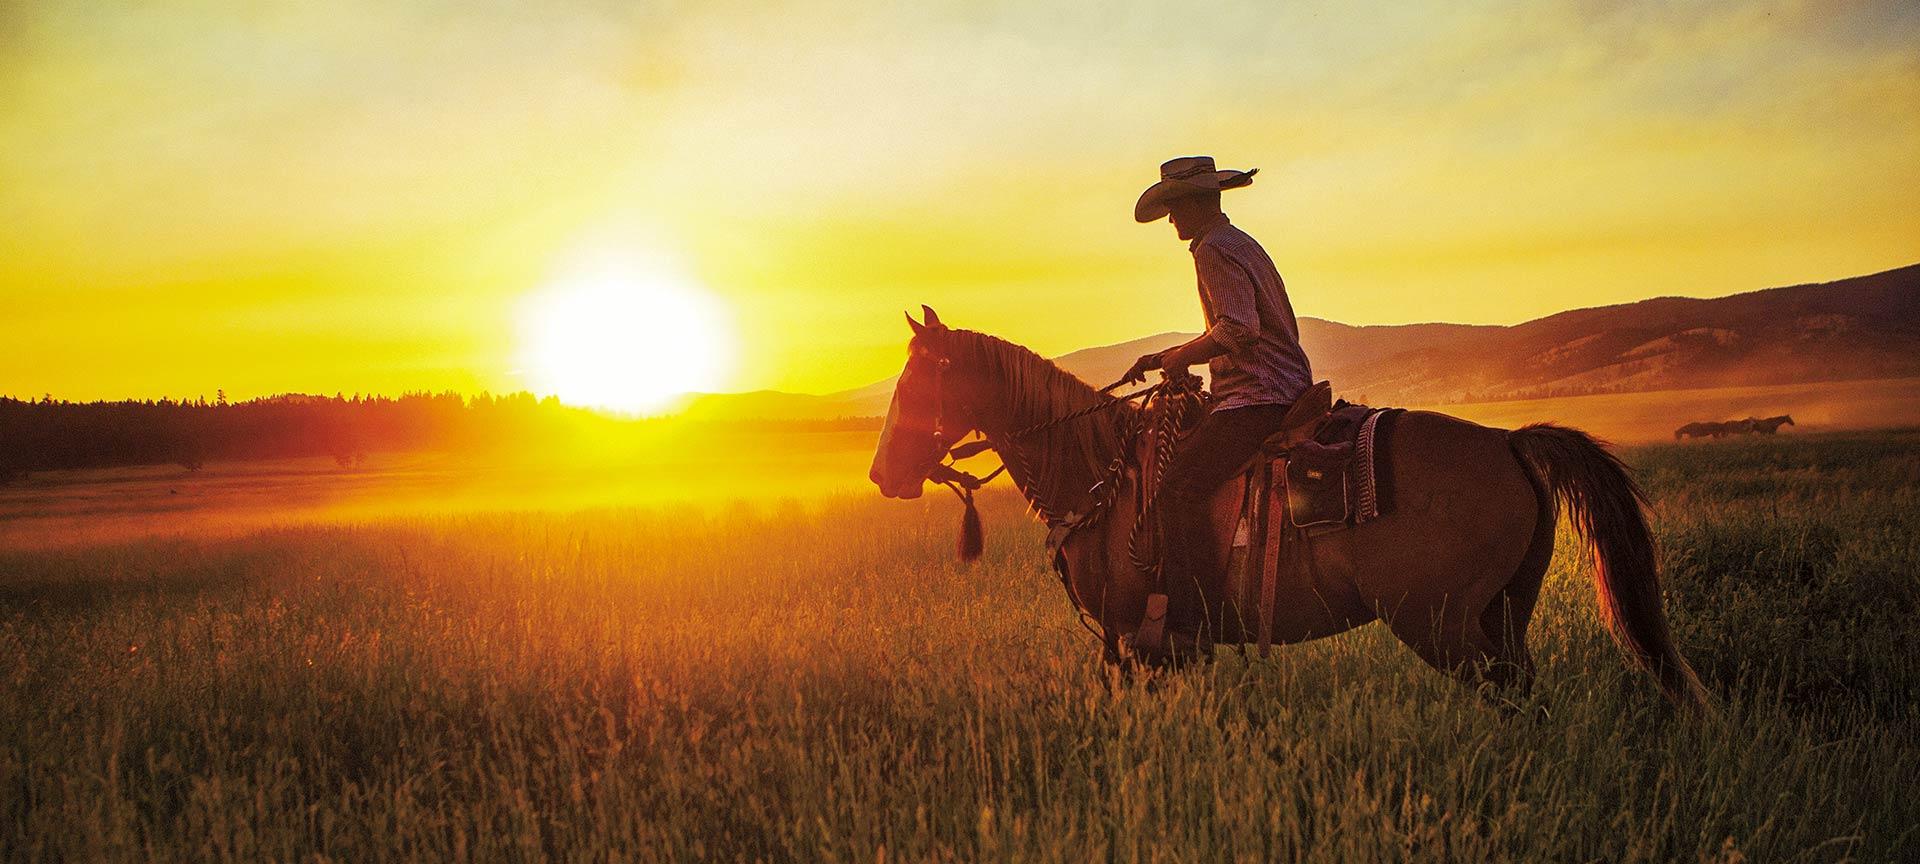 Horseback riding at sunset.